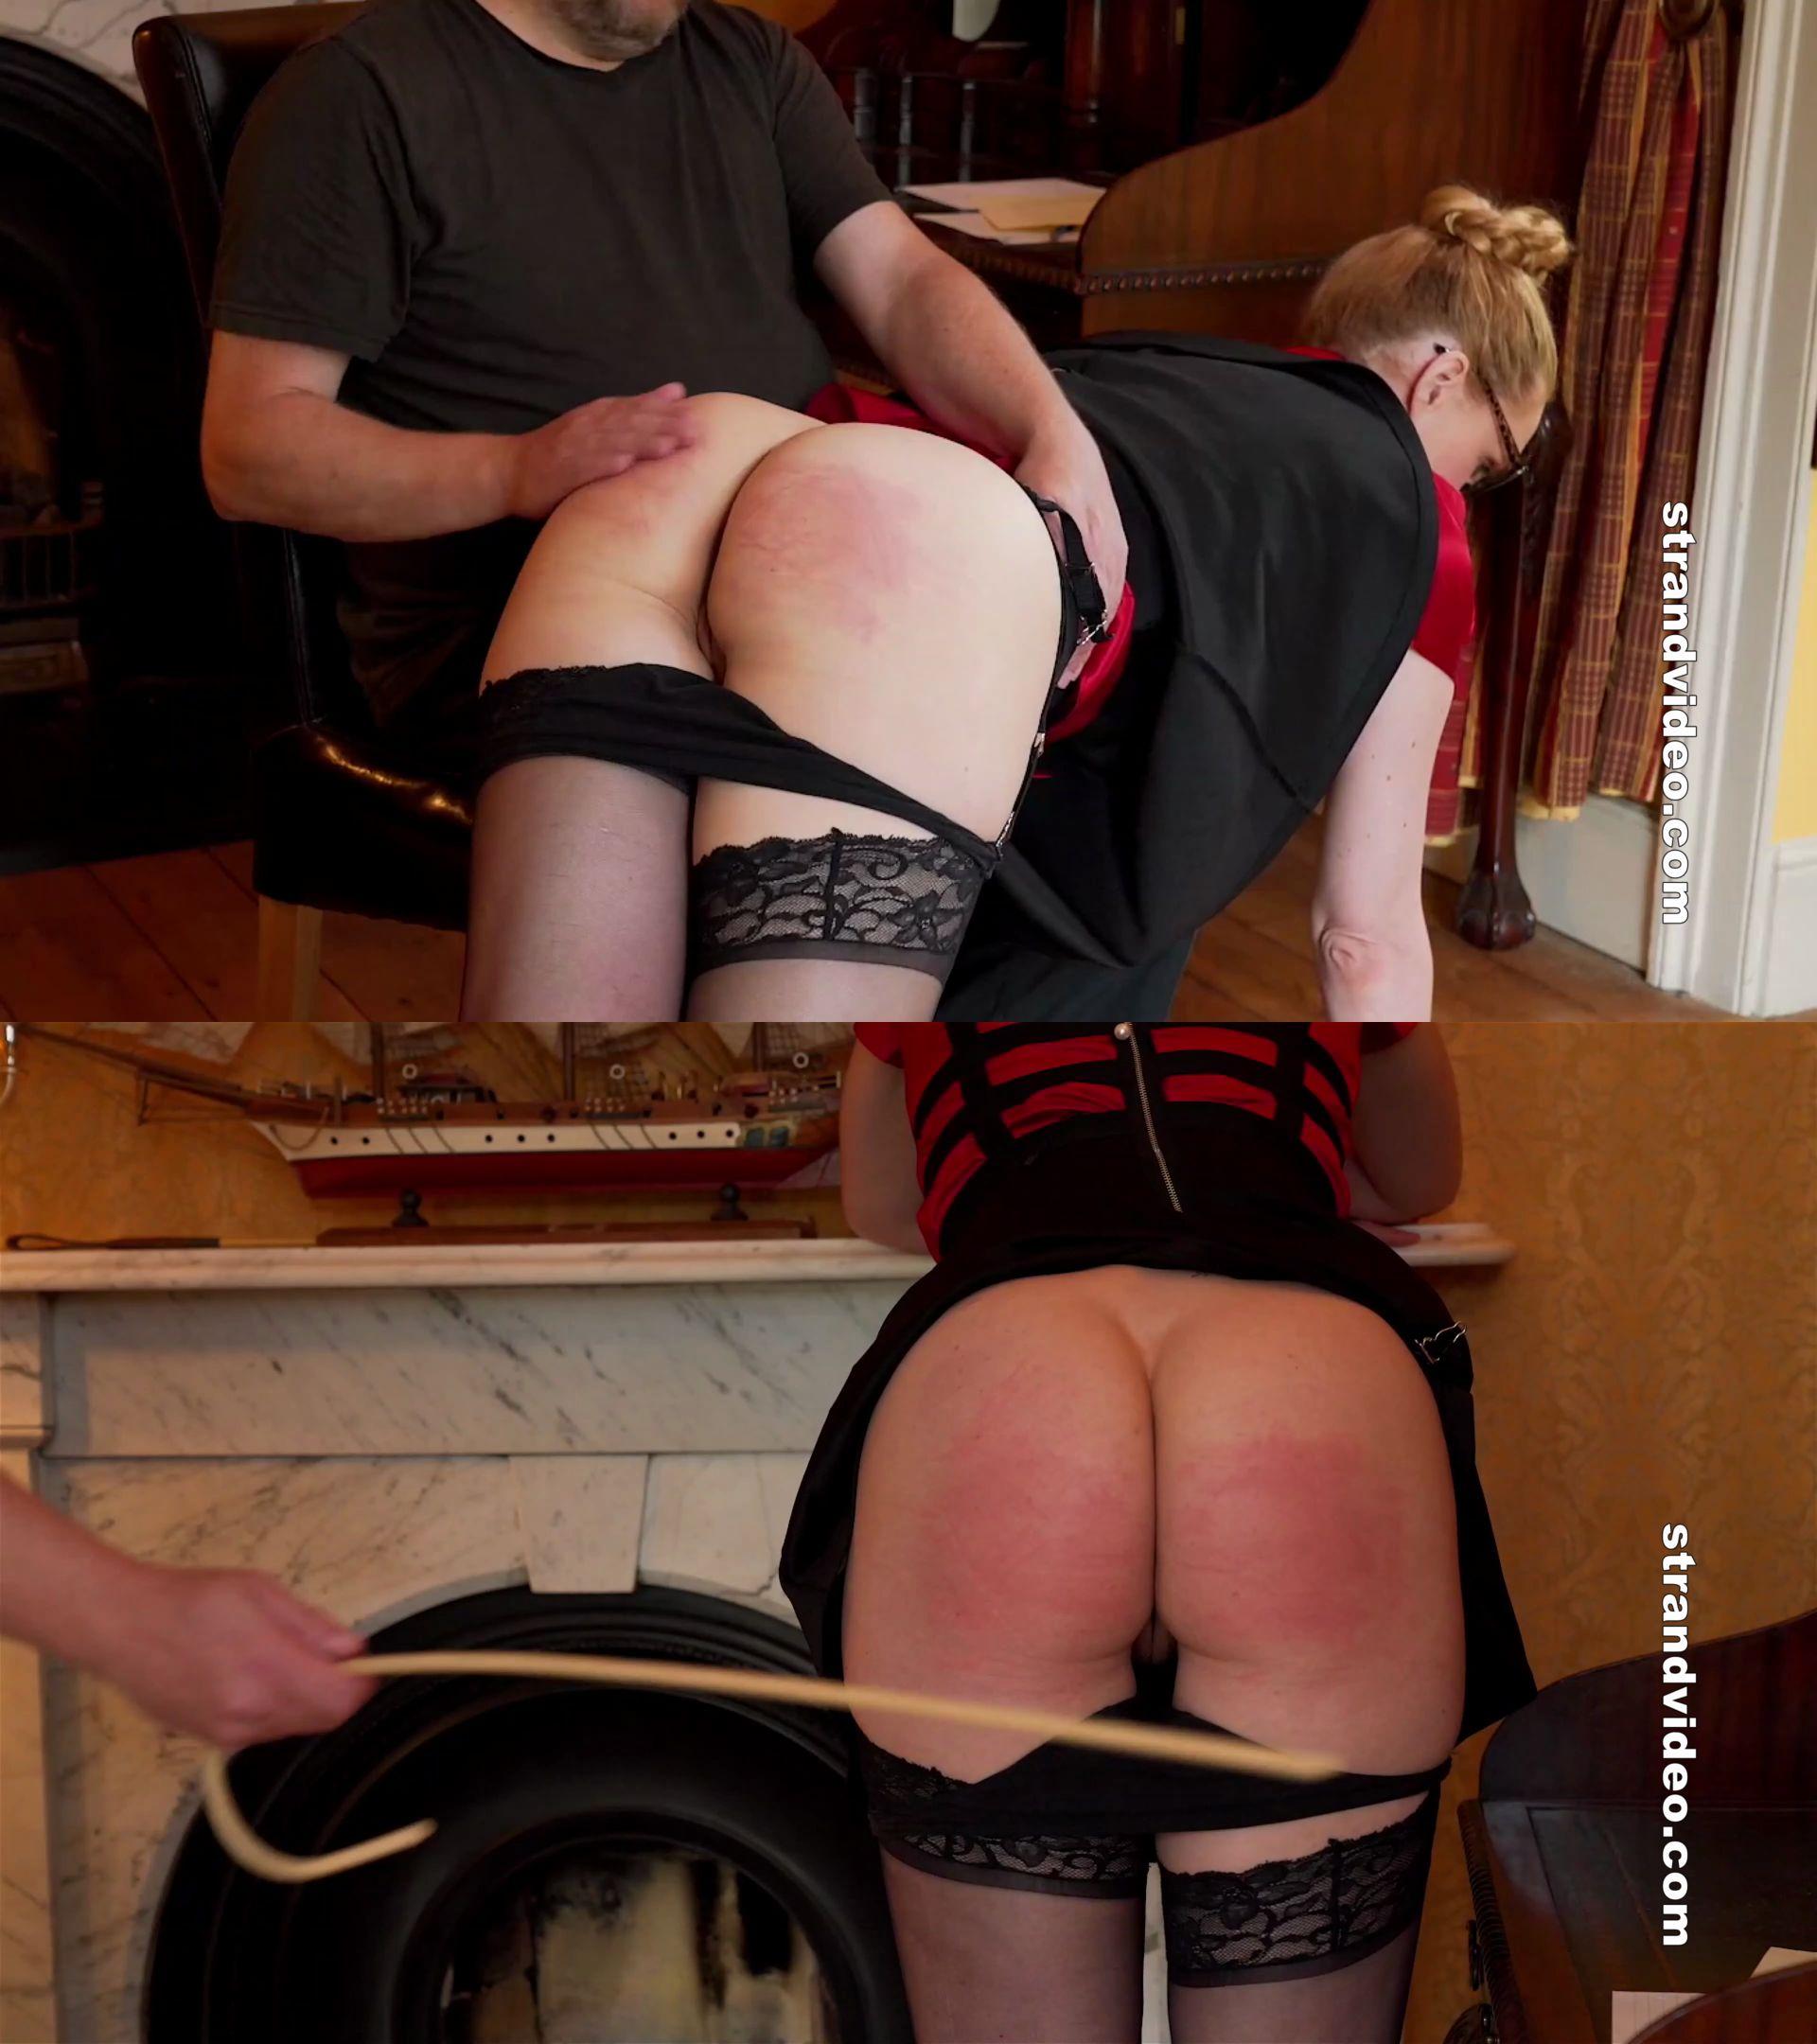 spankingsarah – MP4/HD – Amelia Jane Rutherford – The Predatory Secretary